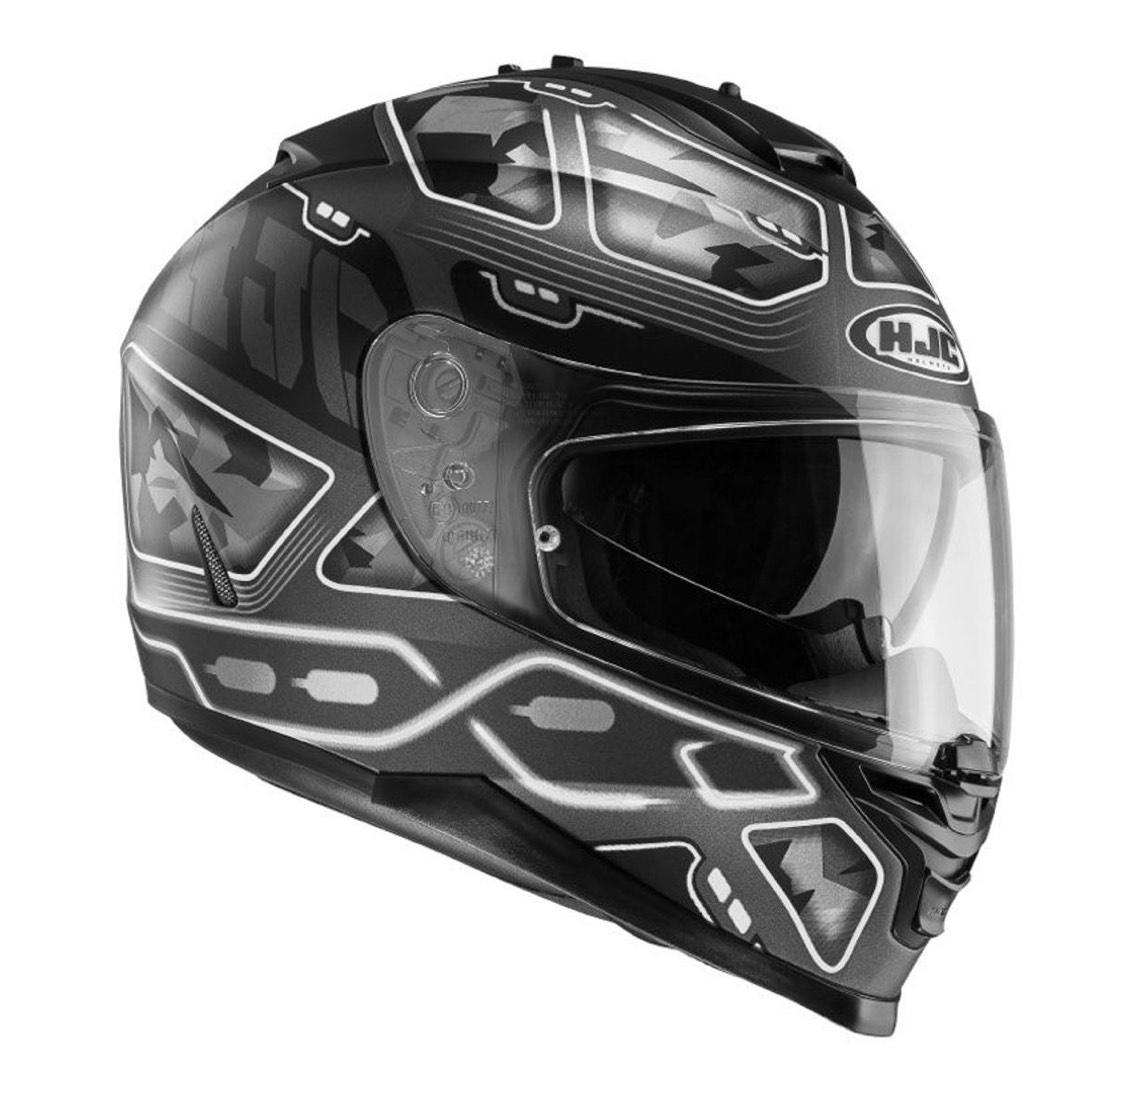 Casque Moto Hjc IS 17 - Uruk